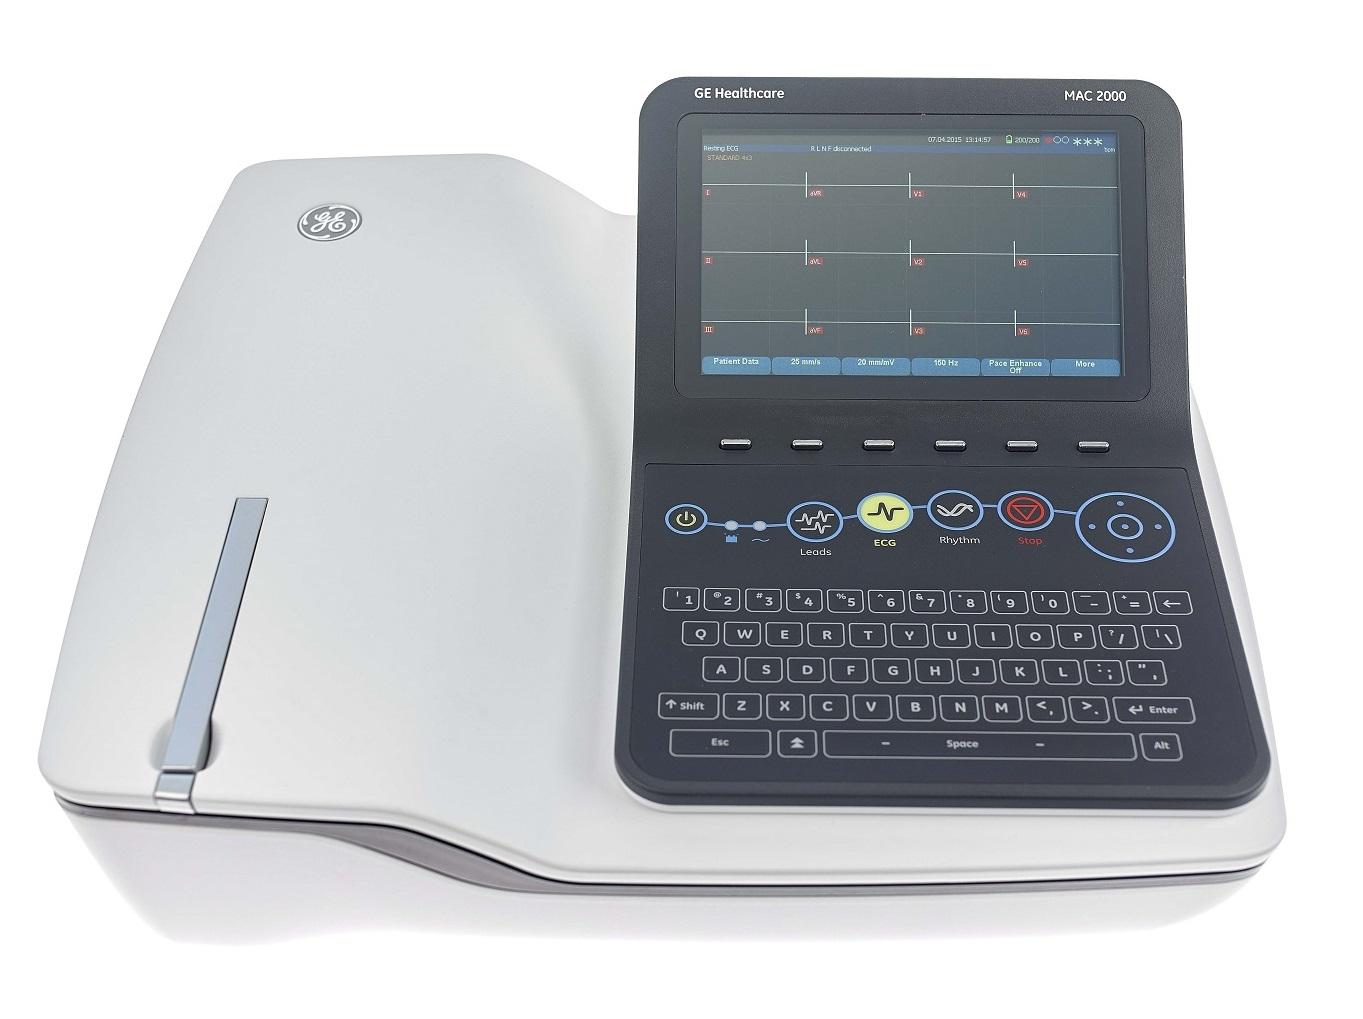 ge mac 2000pc portable resting ecg machine numed healthcare. Black Bedroom Furniture Sets. Home Design Ideas